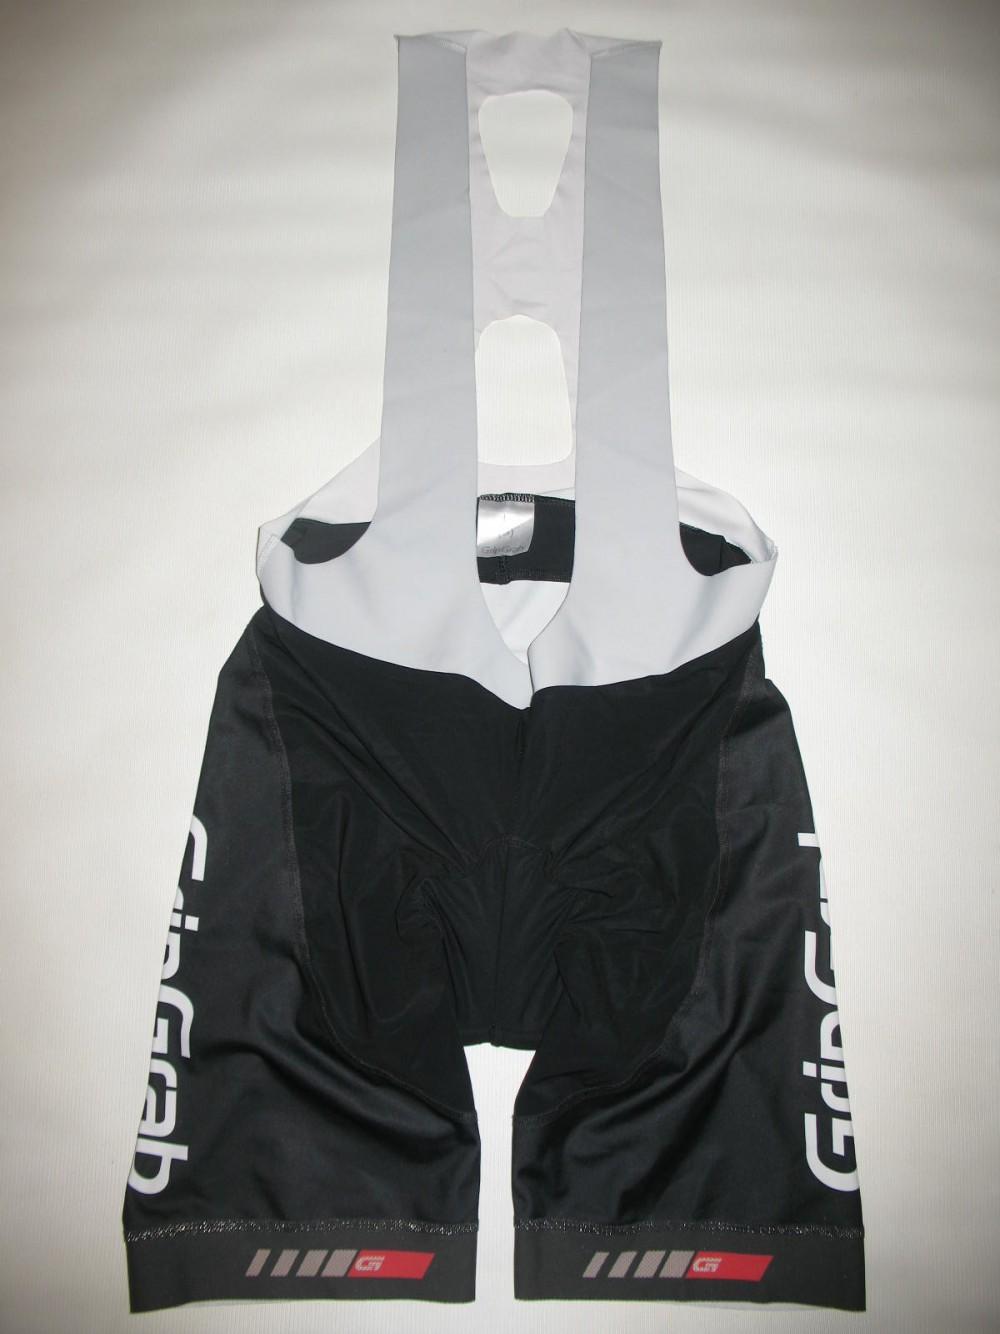 Велошорты GRIPGRAB team cycling bib shorts (размер 5-XL) - 2